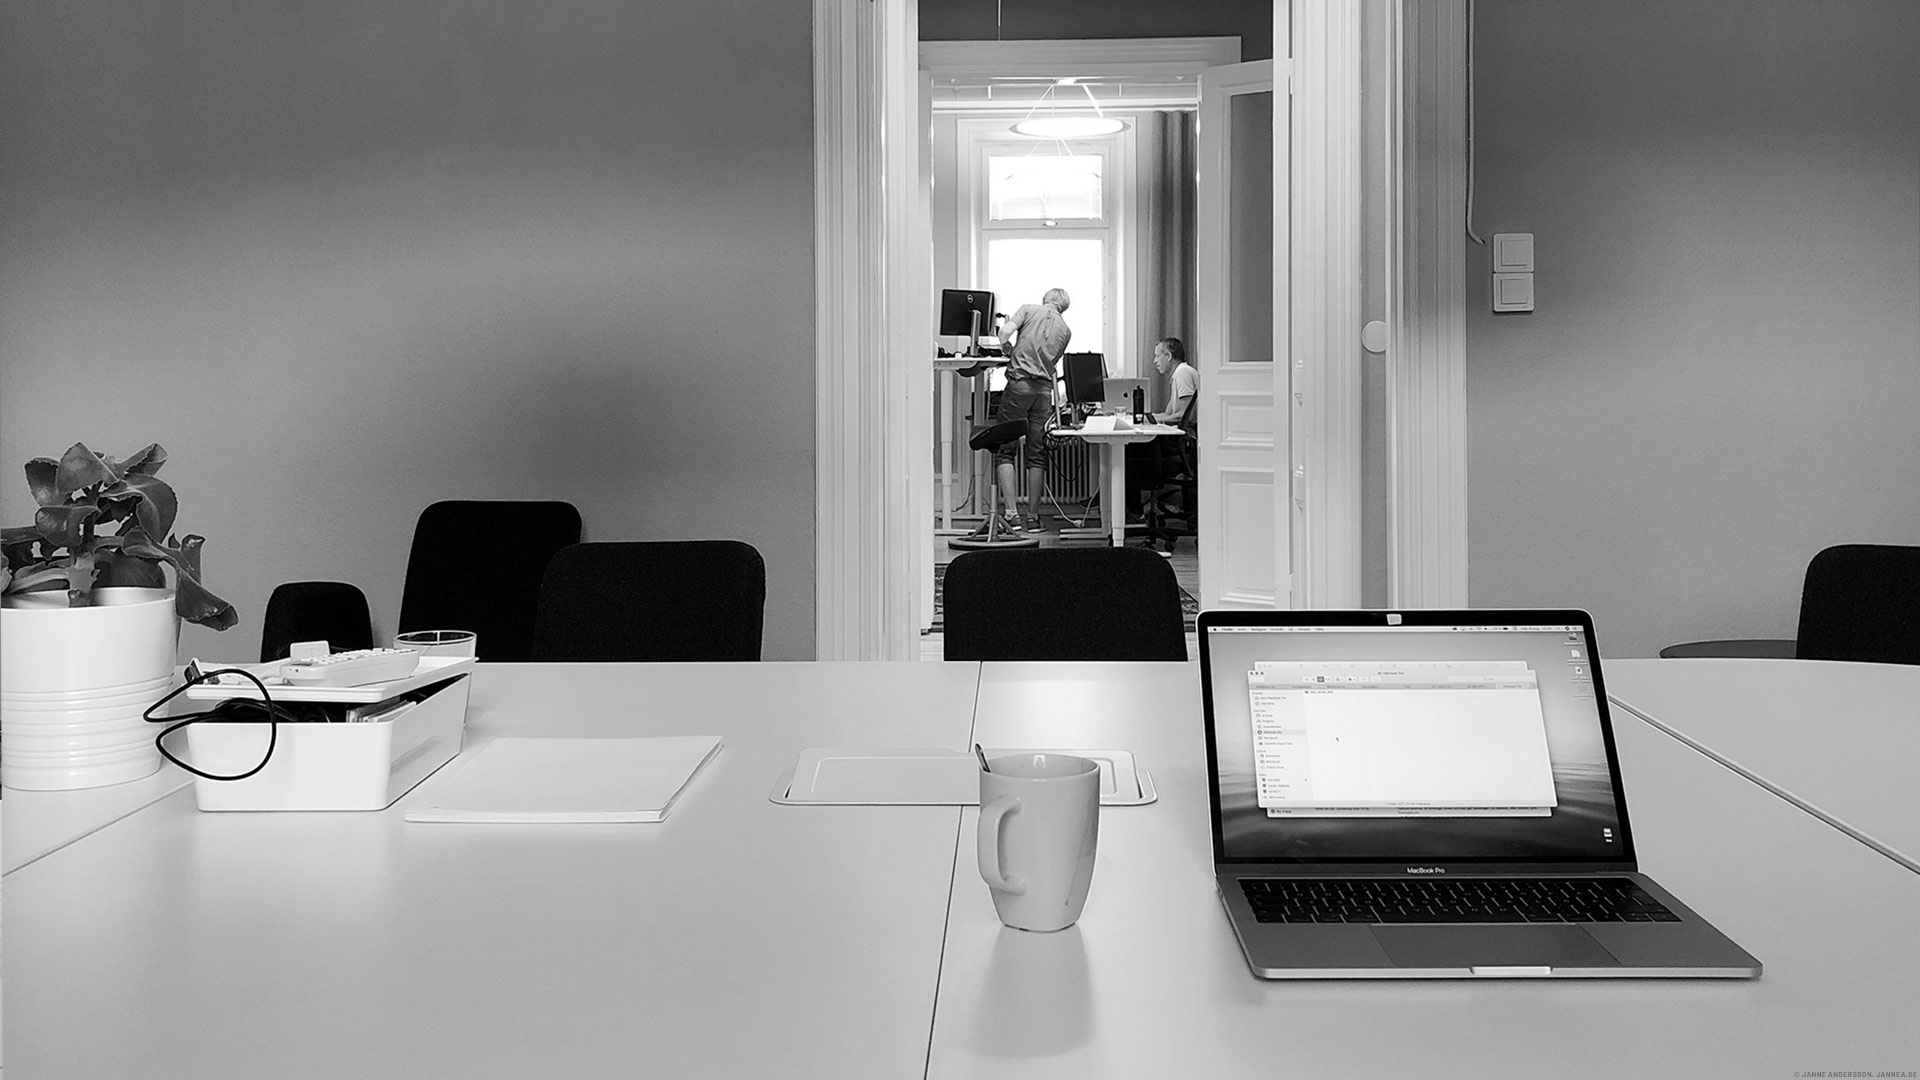 Tillbaka på kontoret efter semestern |©Janne A